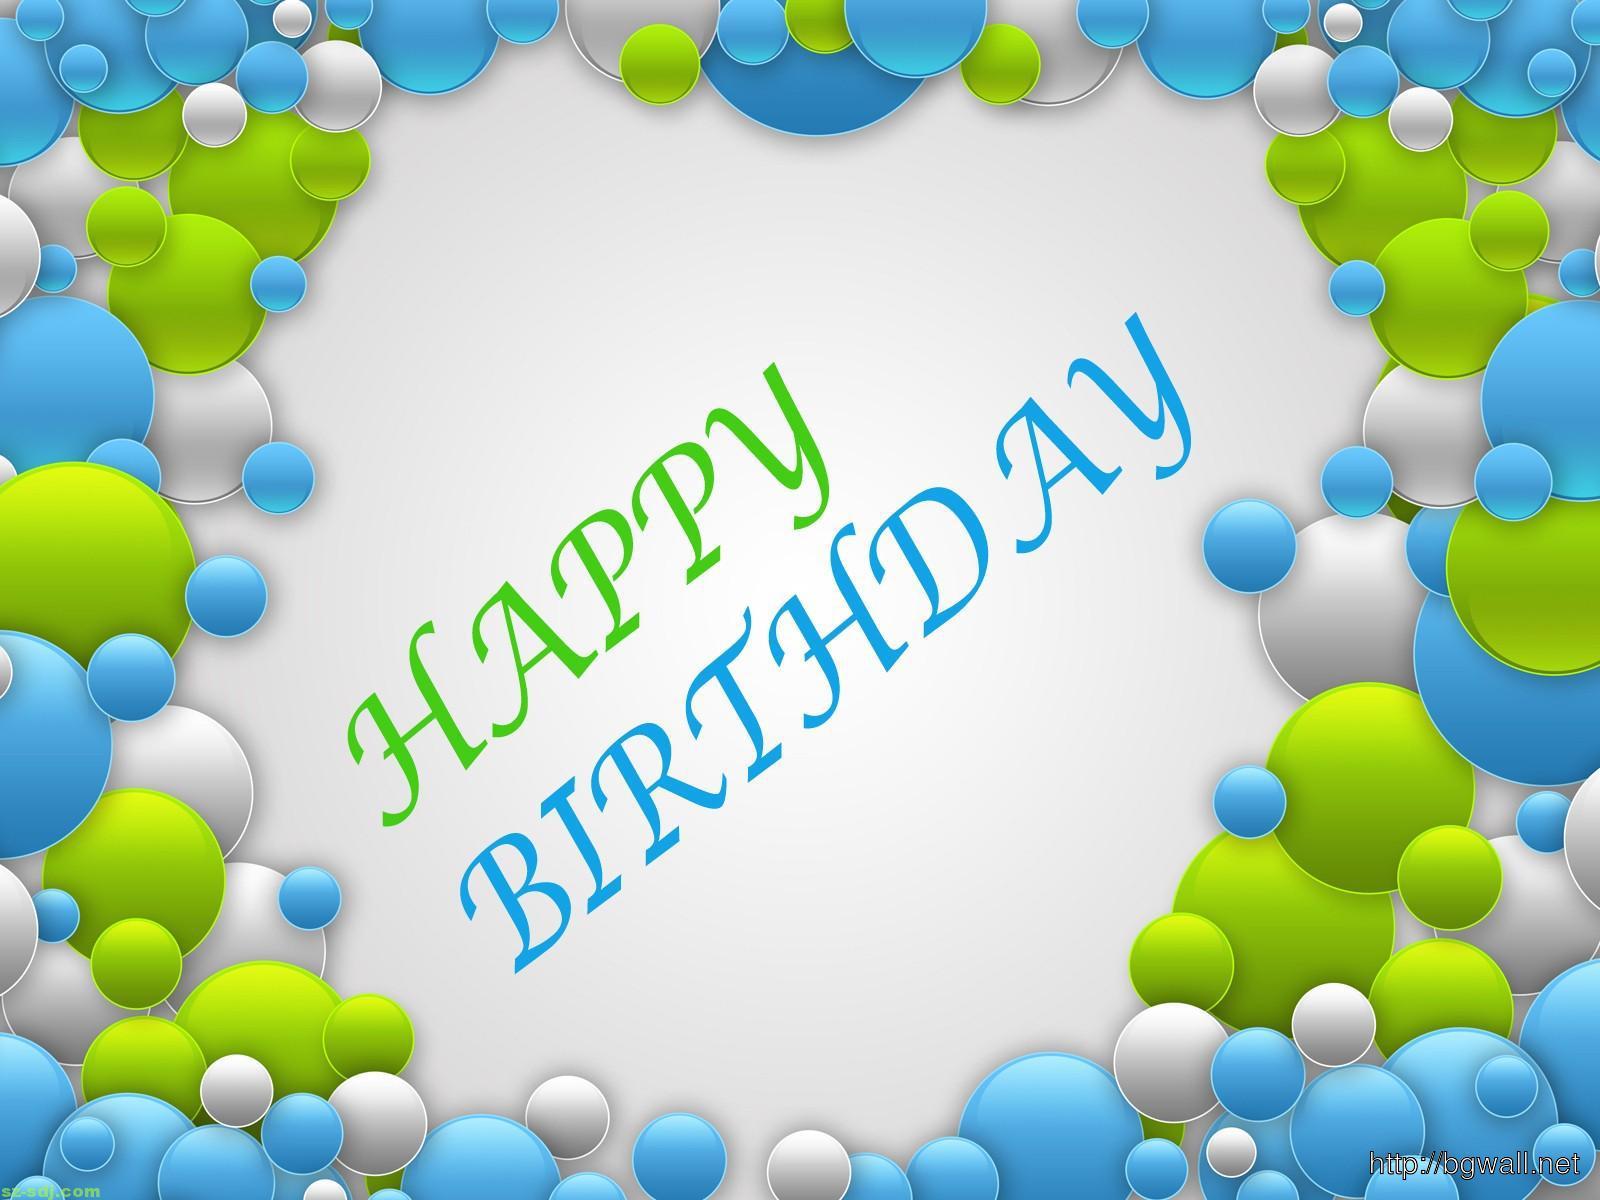 happy birthday wallpaper desktop Background Wallpaper HD 1600x1200